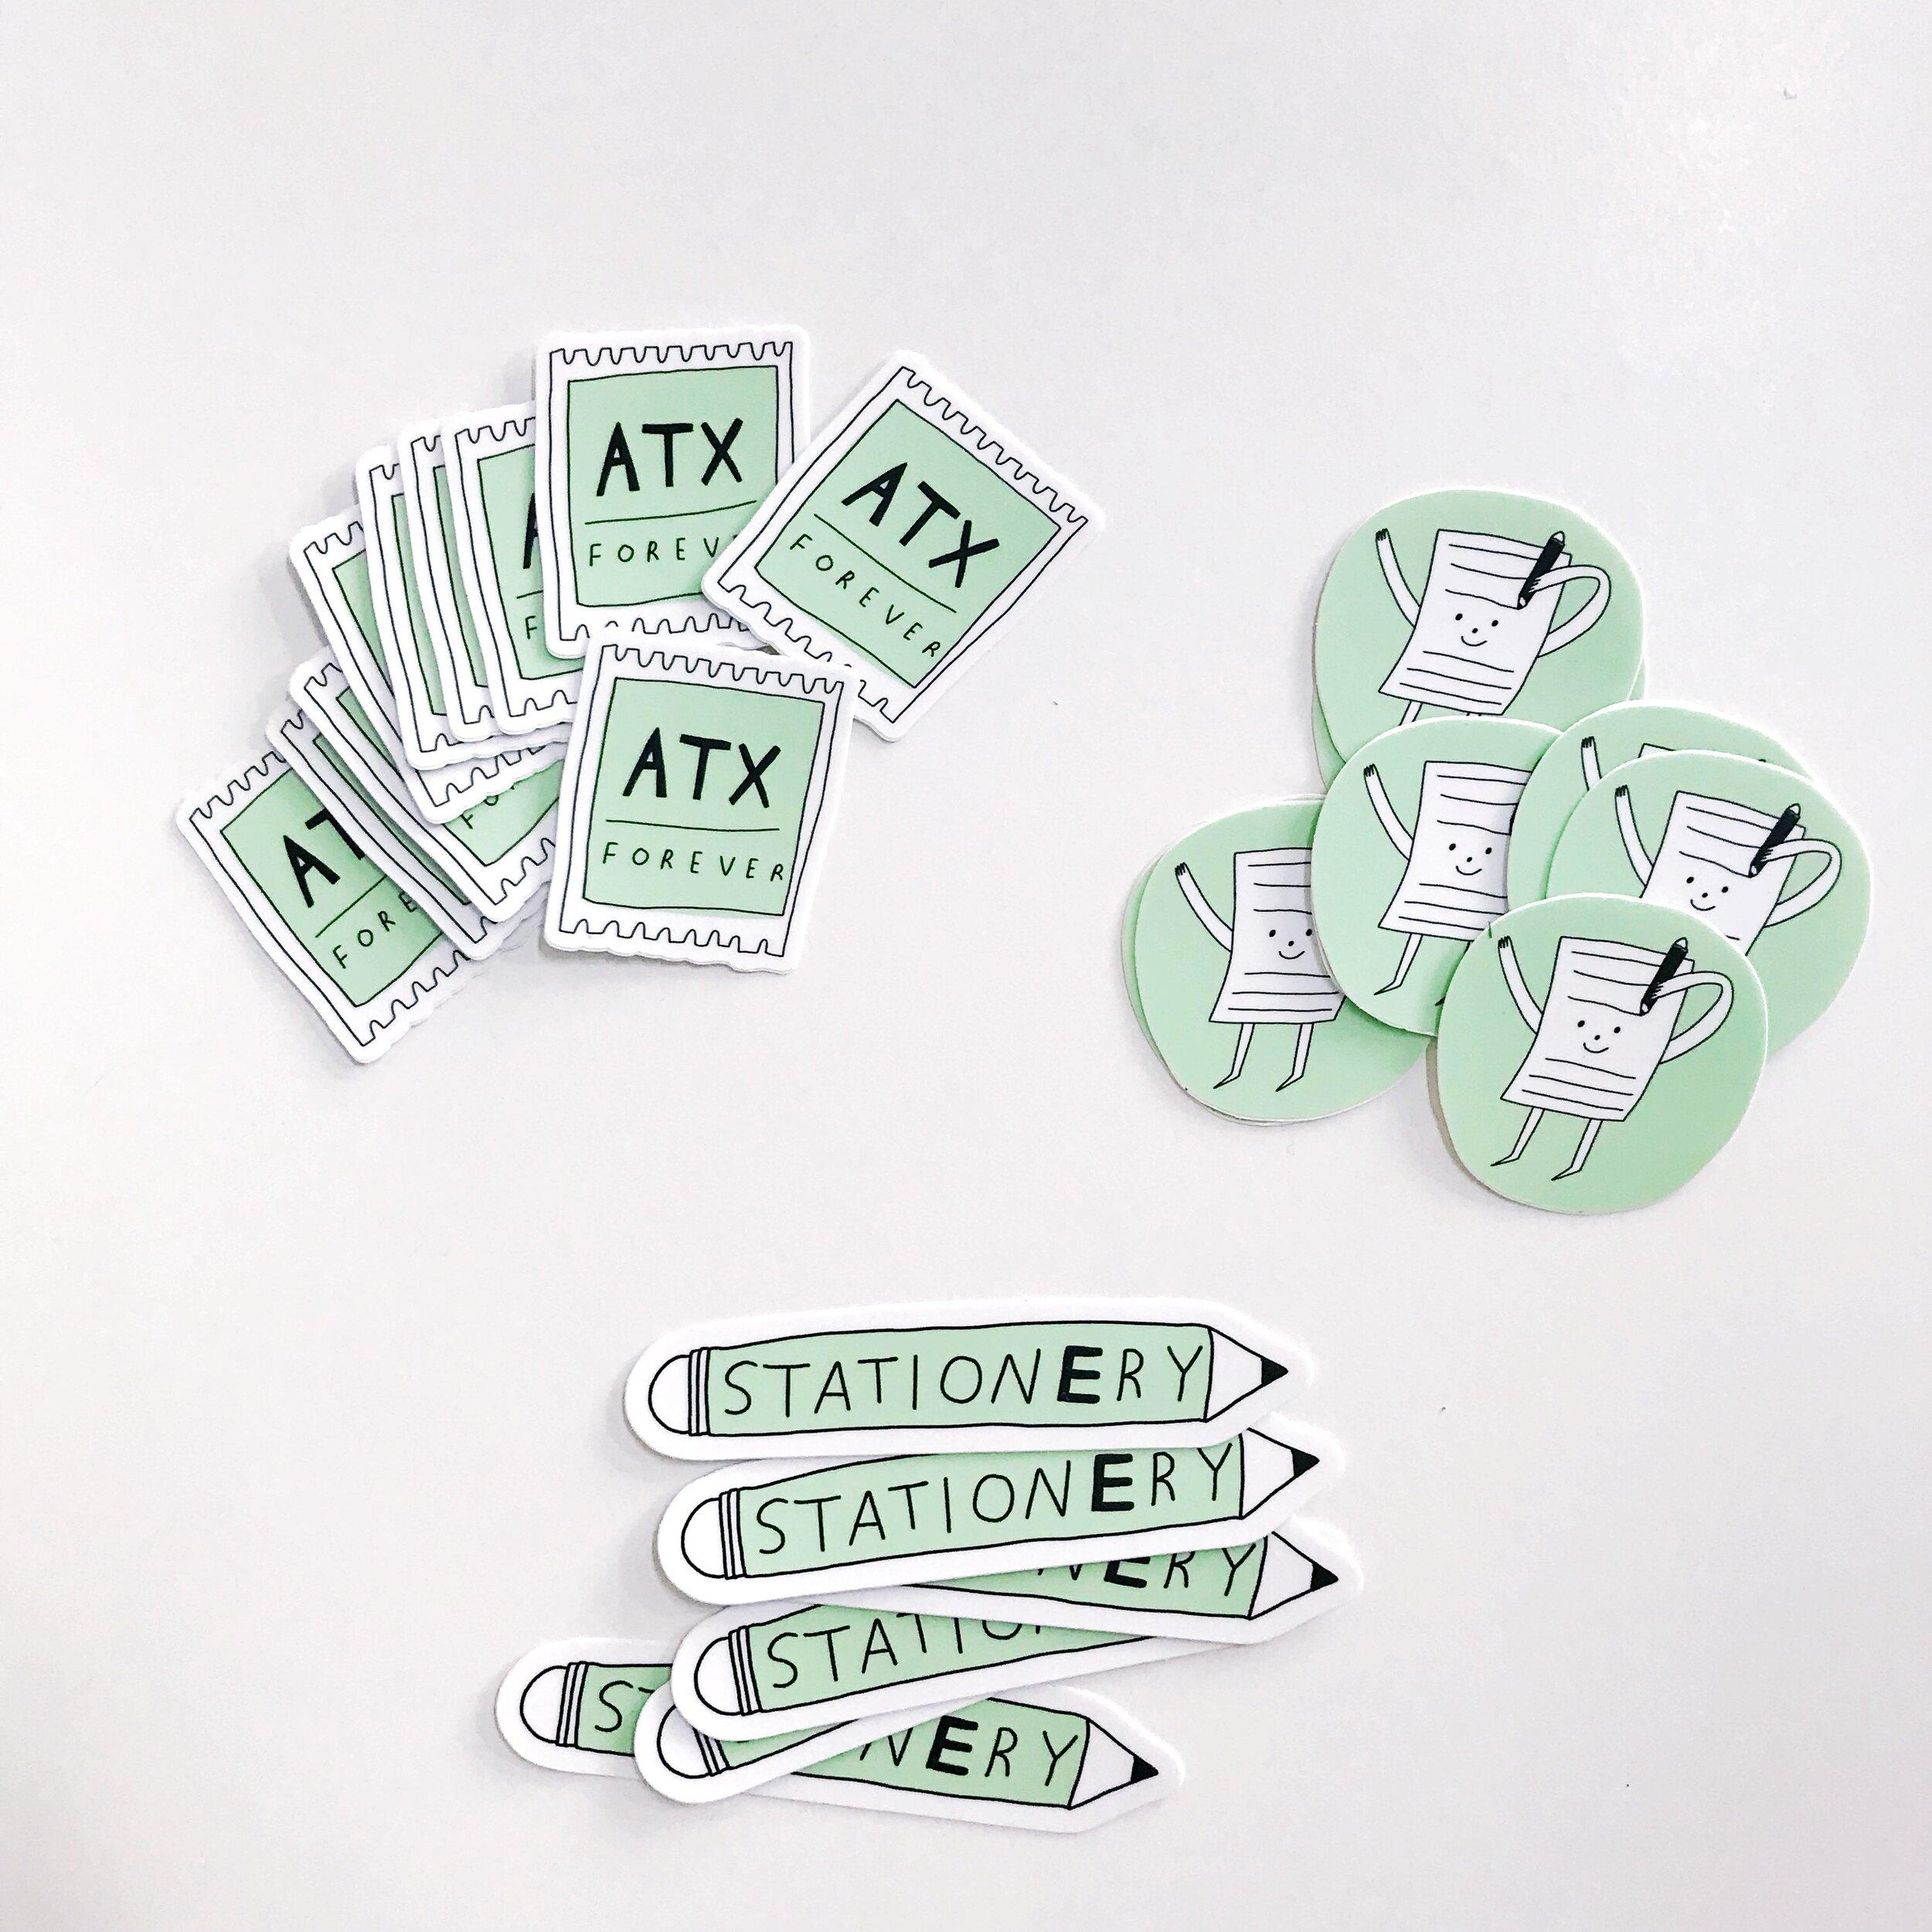 papercraftpantry-smallbusinessblog-stickermule-retail.jpg